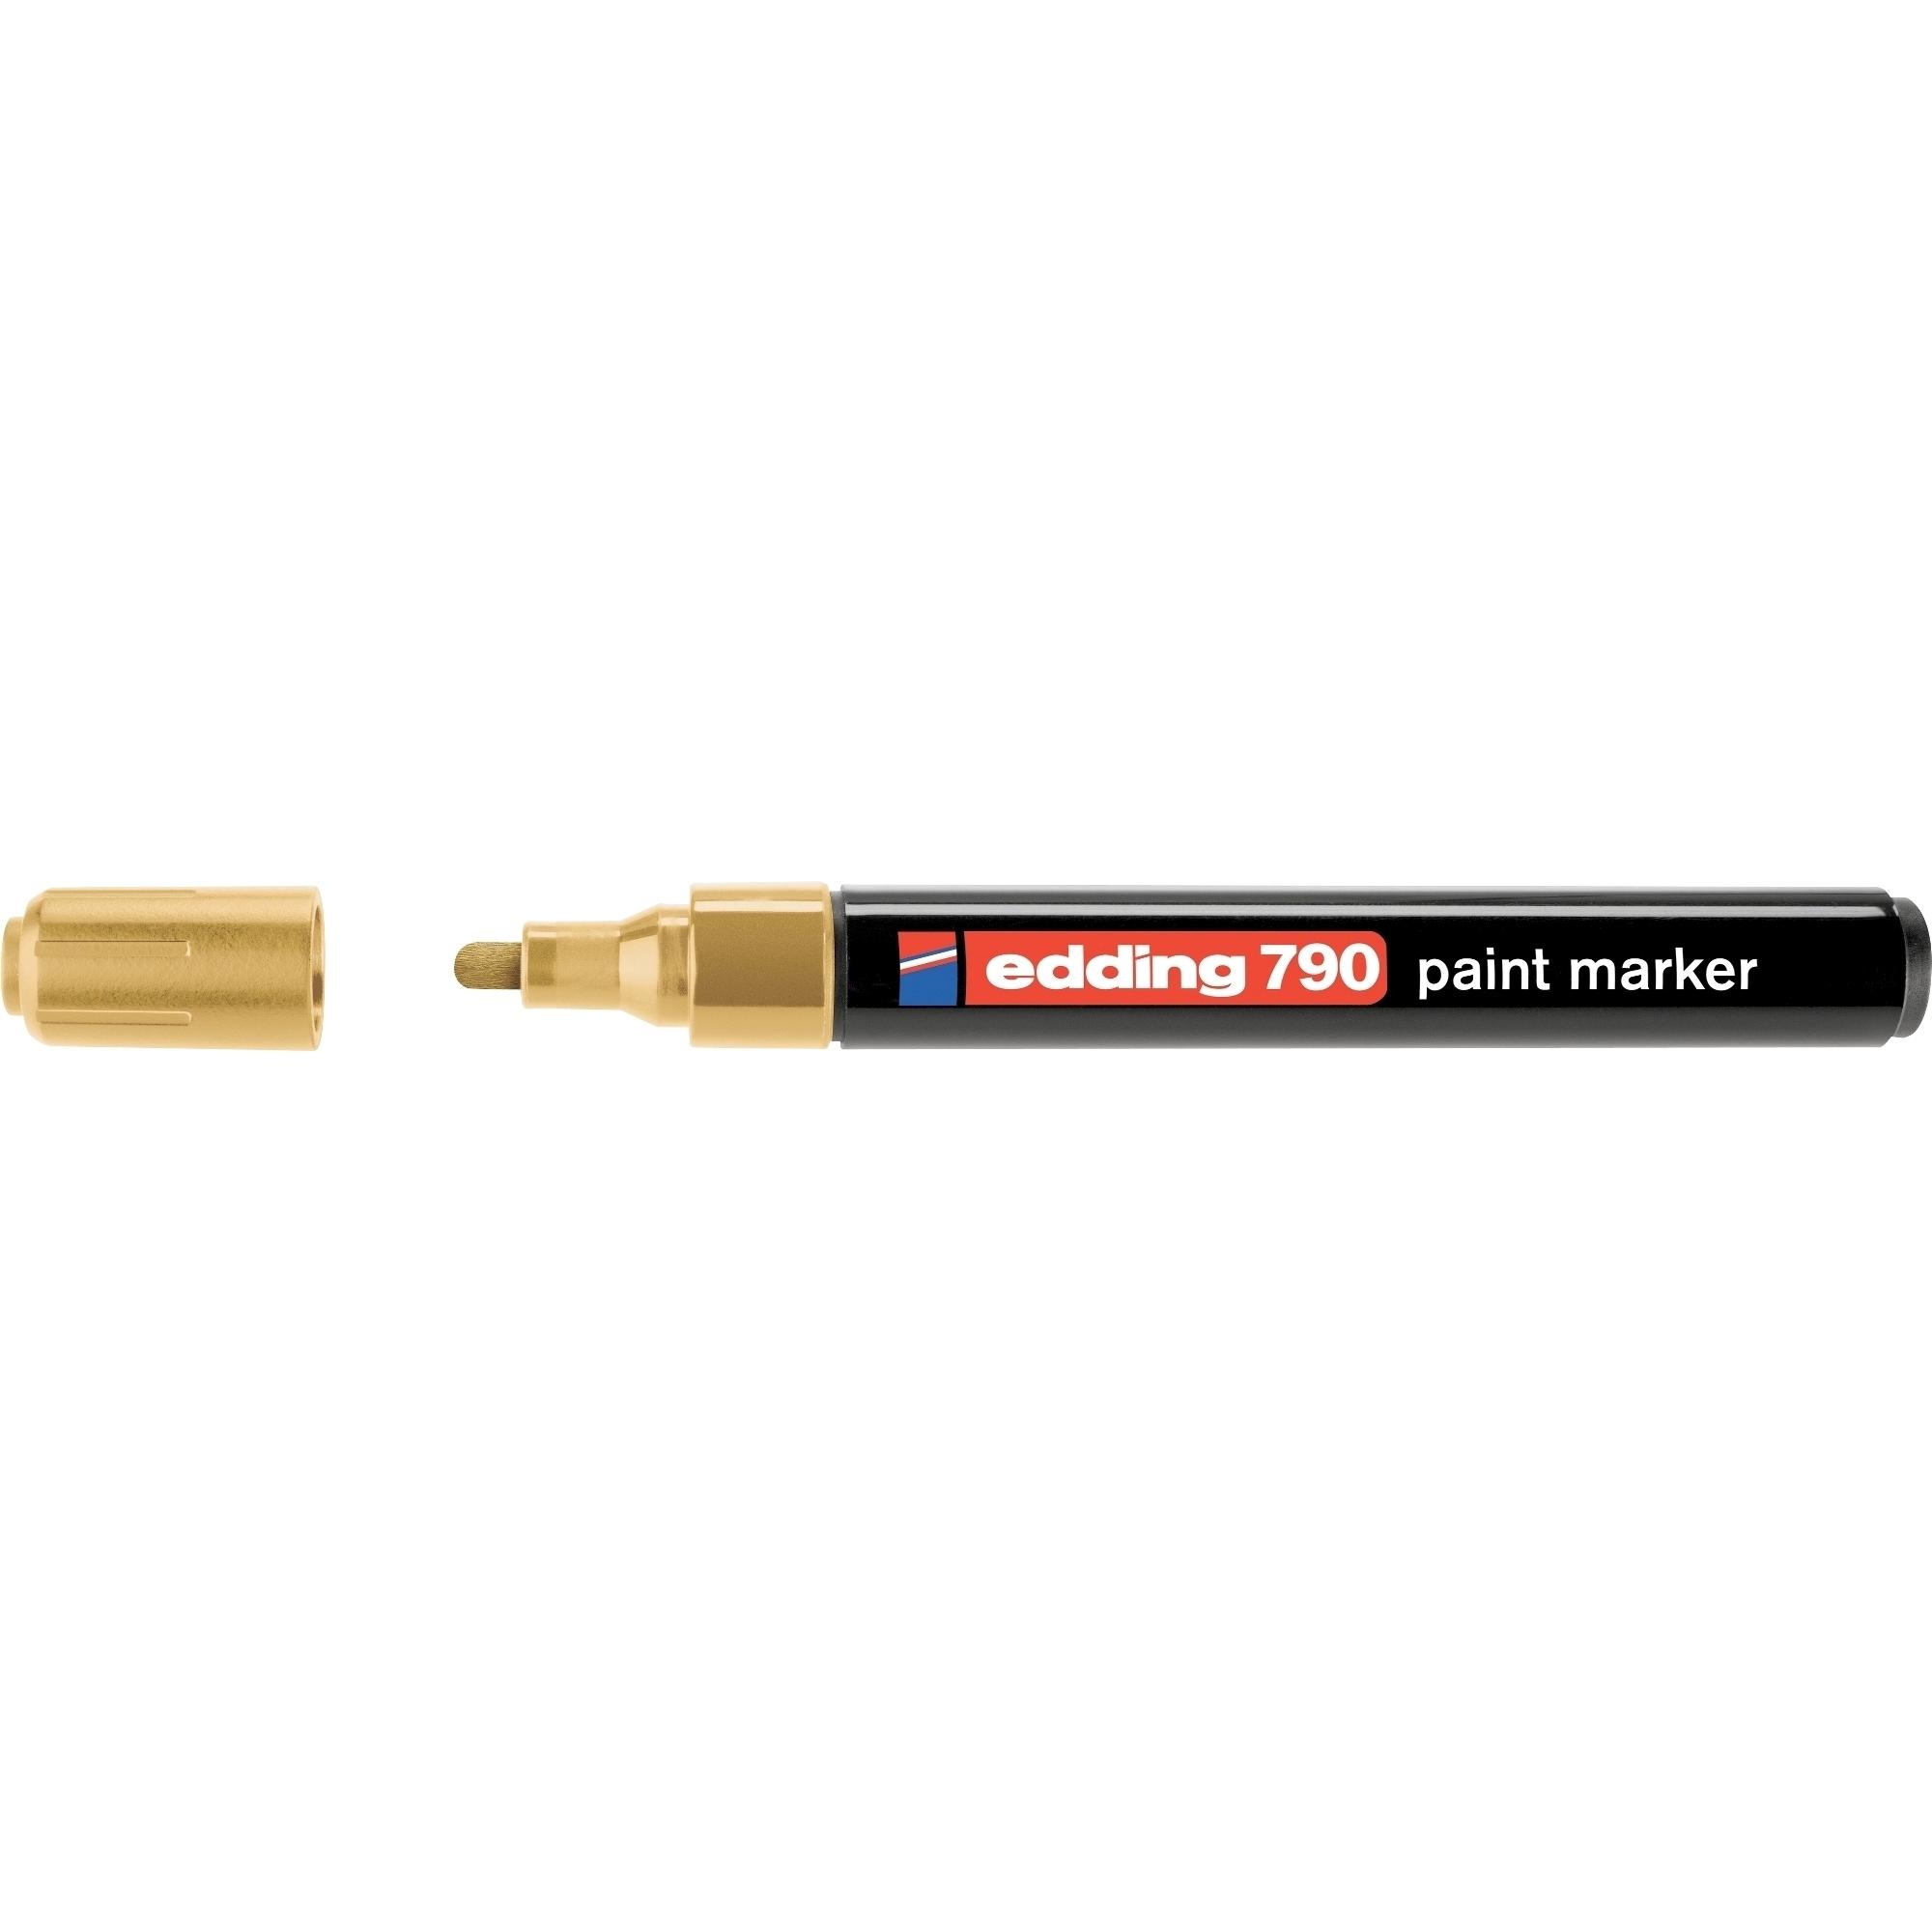 Marker permanent Edding 790, cu vopsea, corp plastic, varf rotund, 2-3 mm, auriu